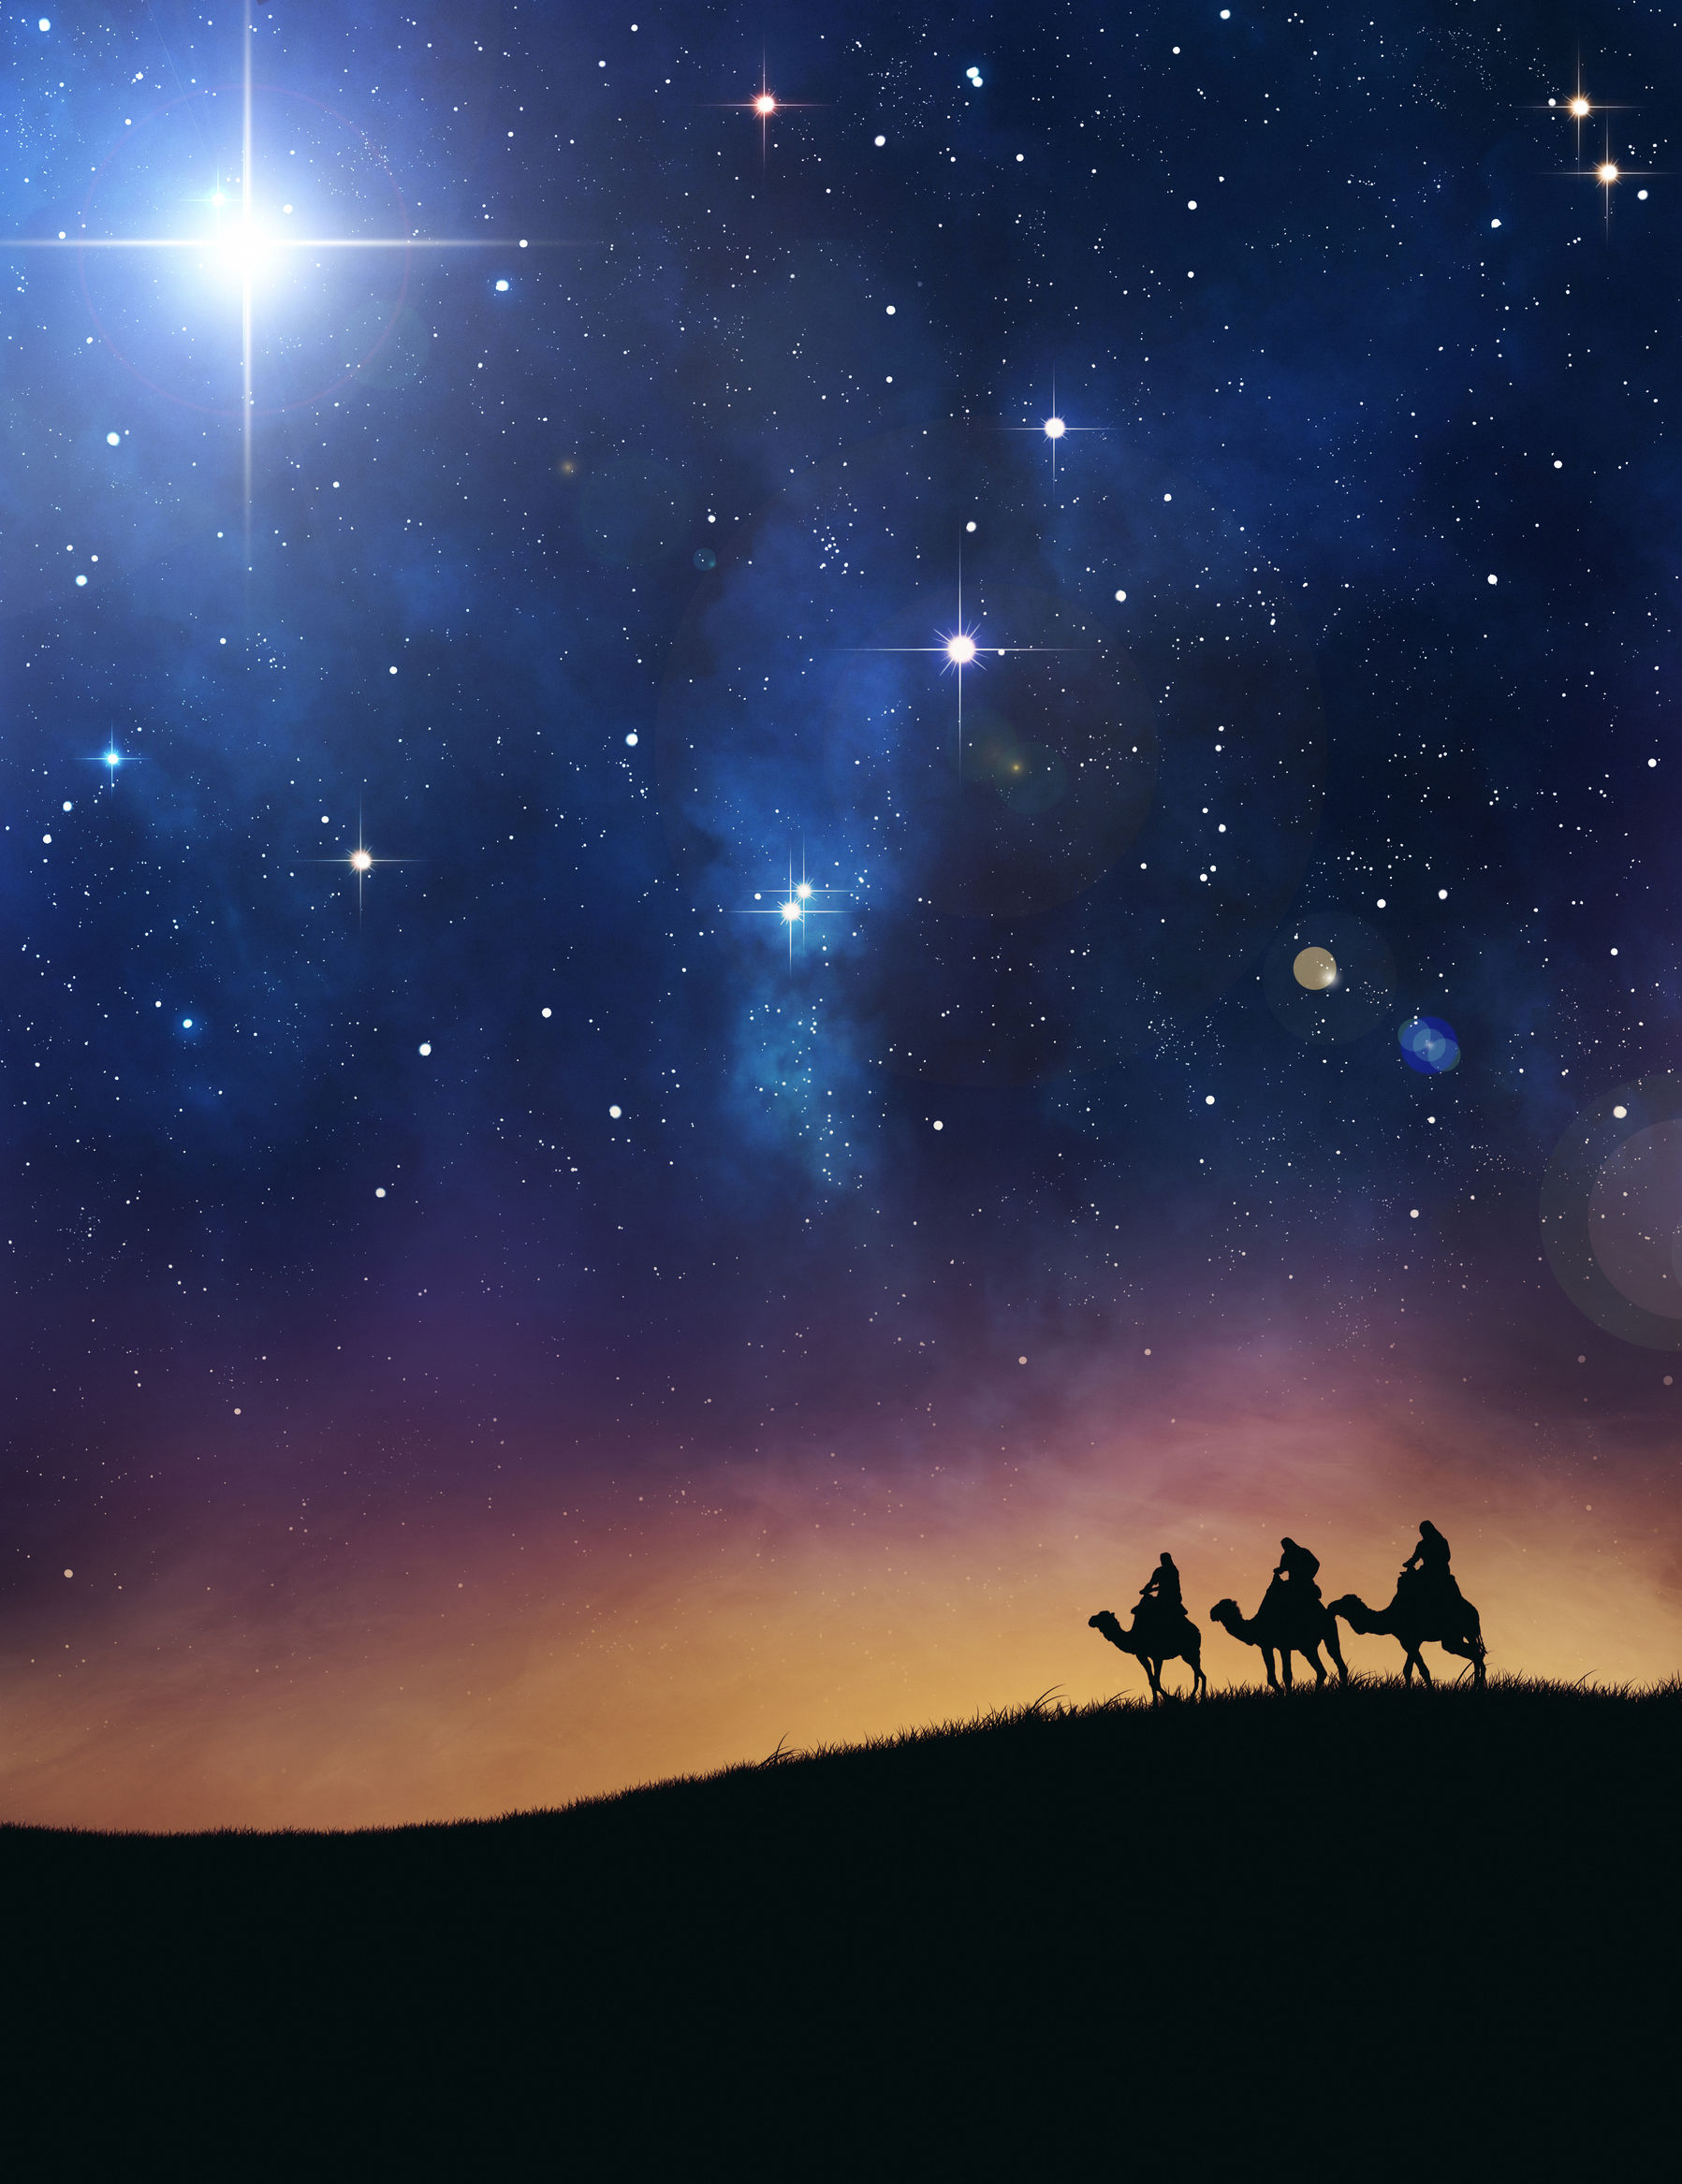 23765480 - three wise men following the star of bethlehem.